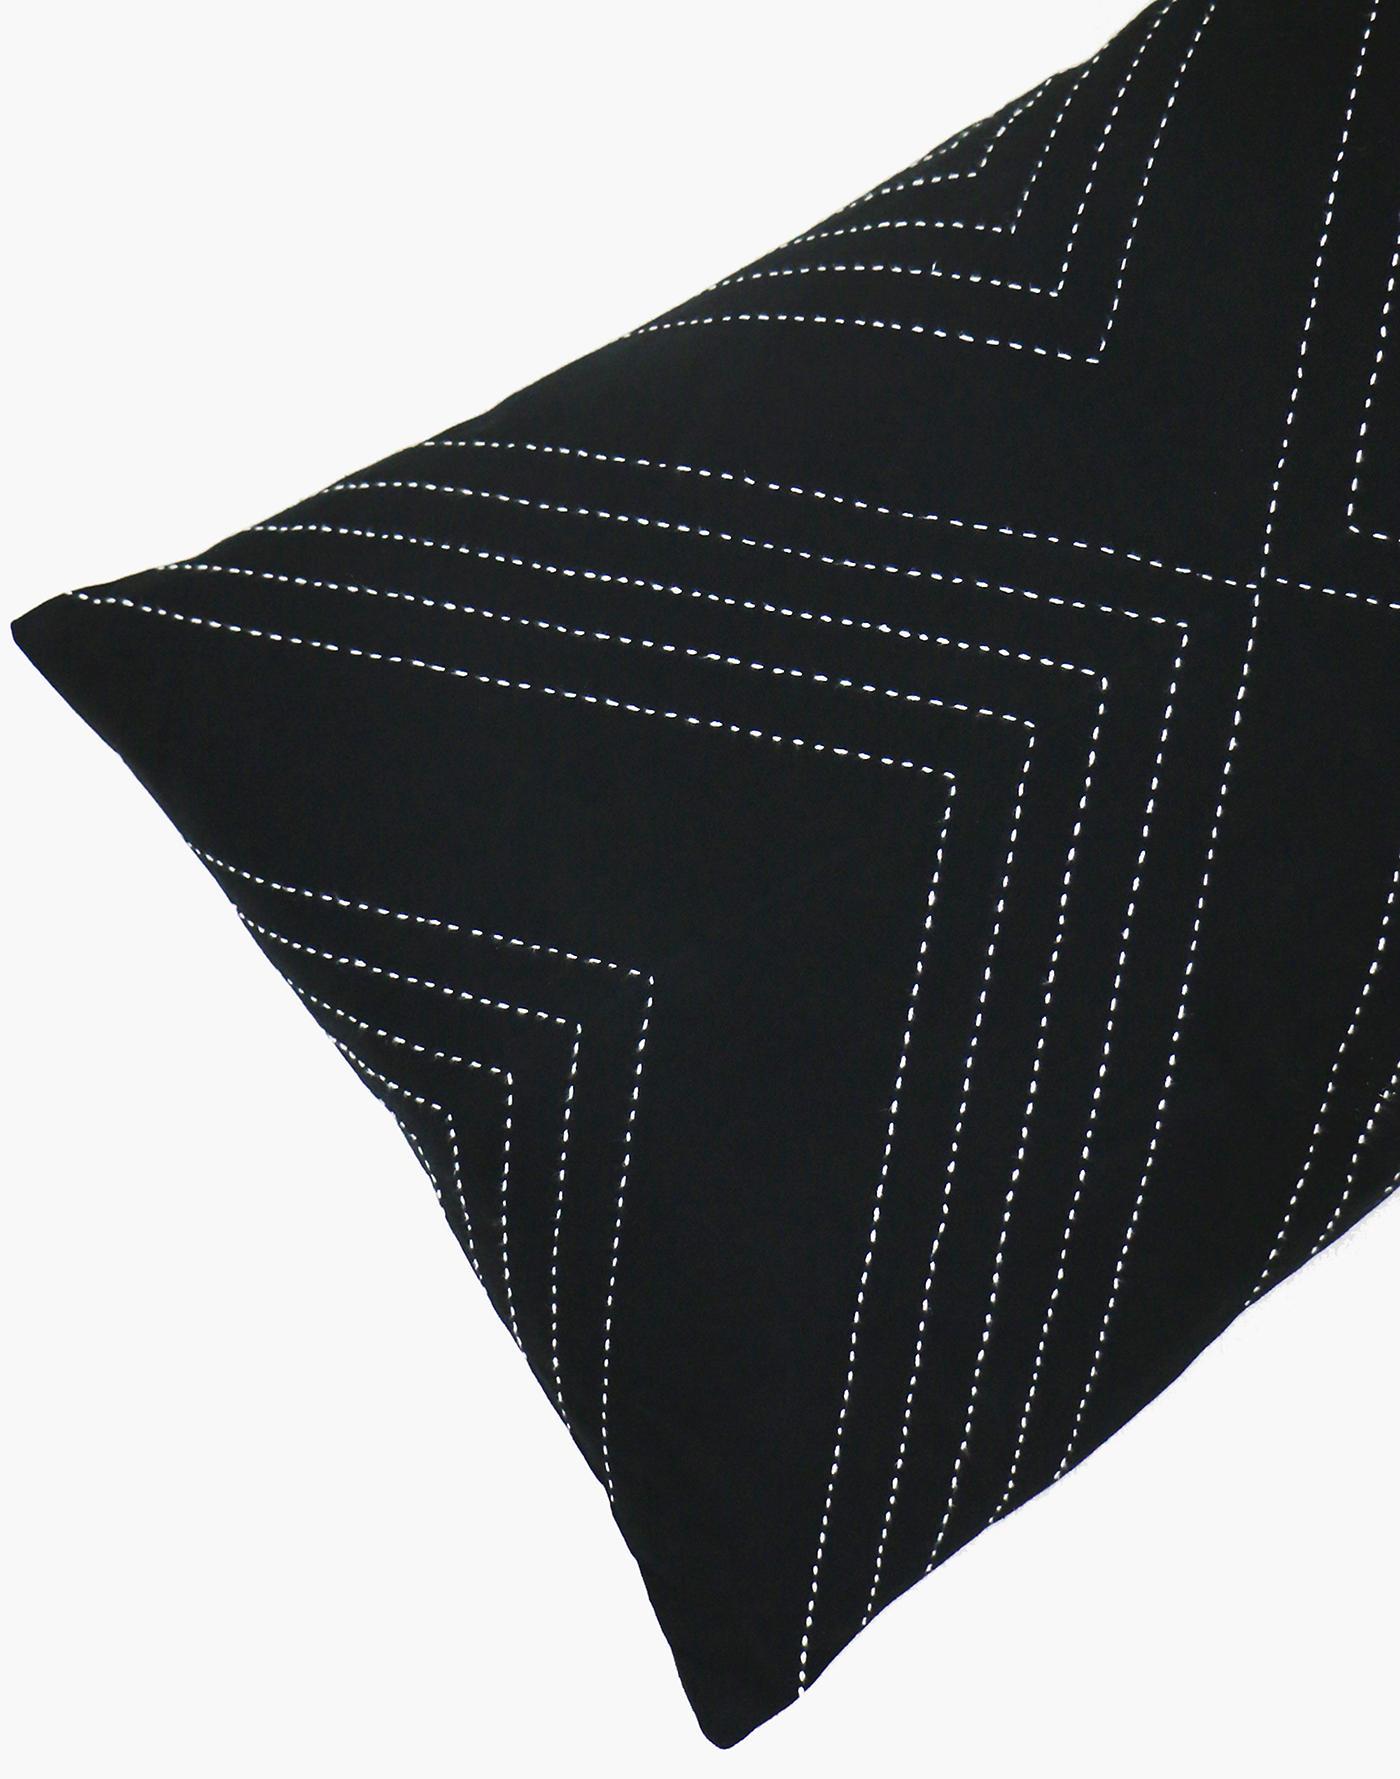 Madewell Anchal Organic Cotton Geometric Lumbar Pillow